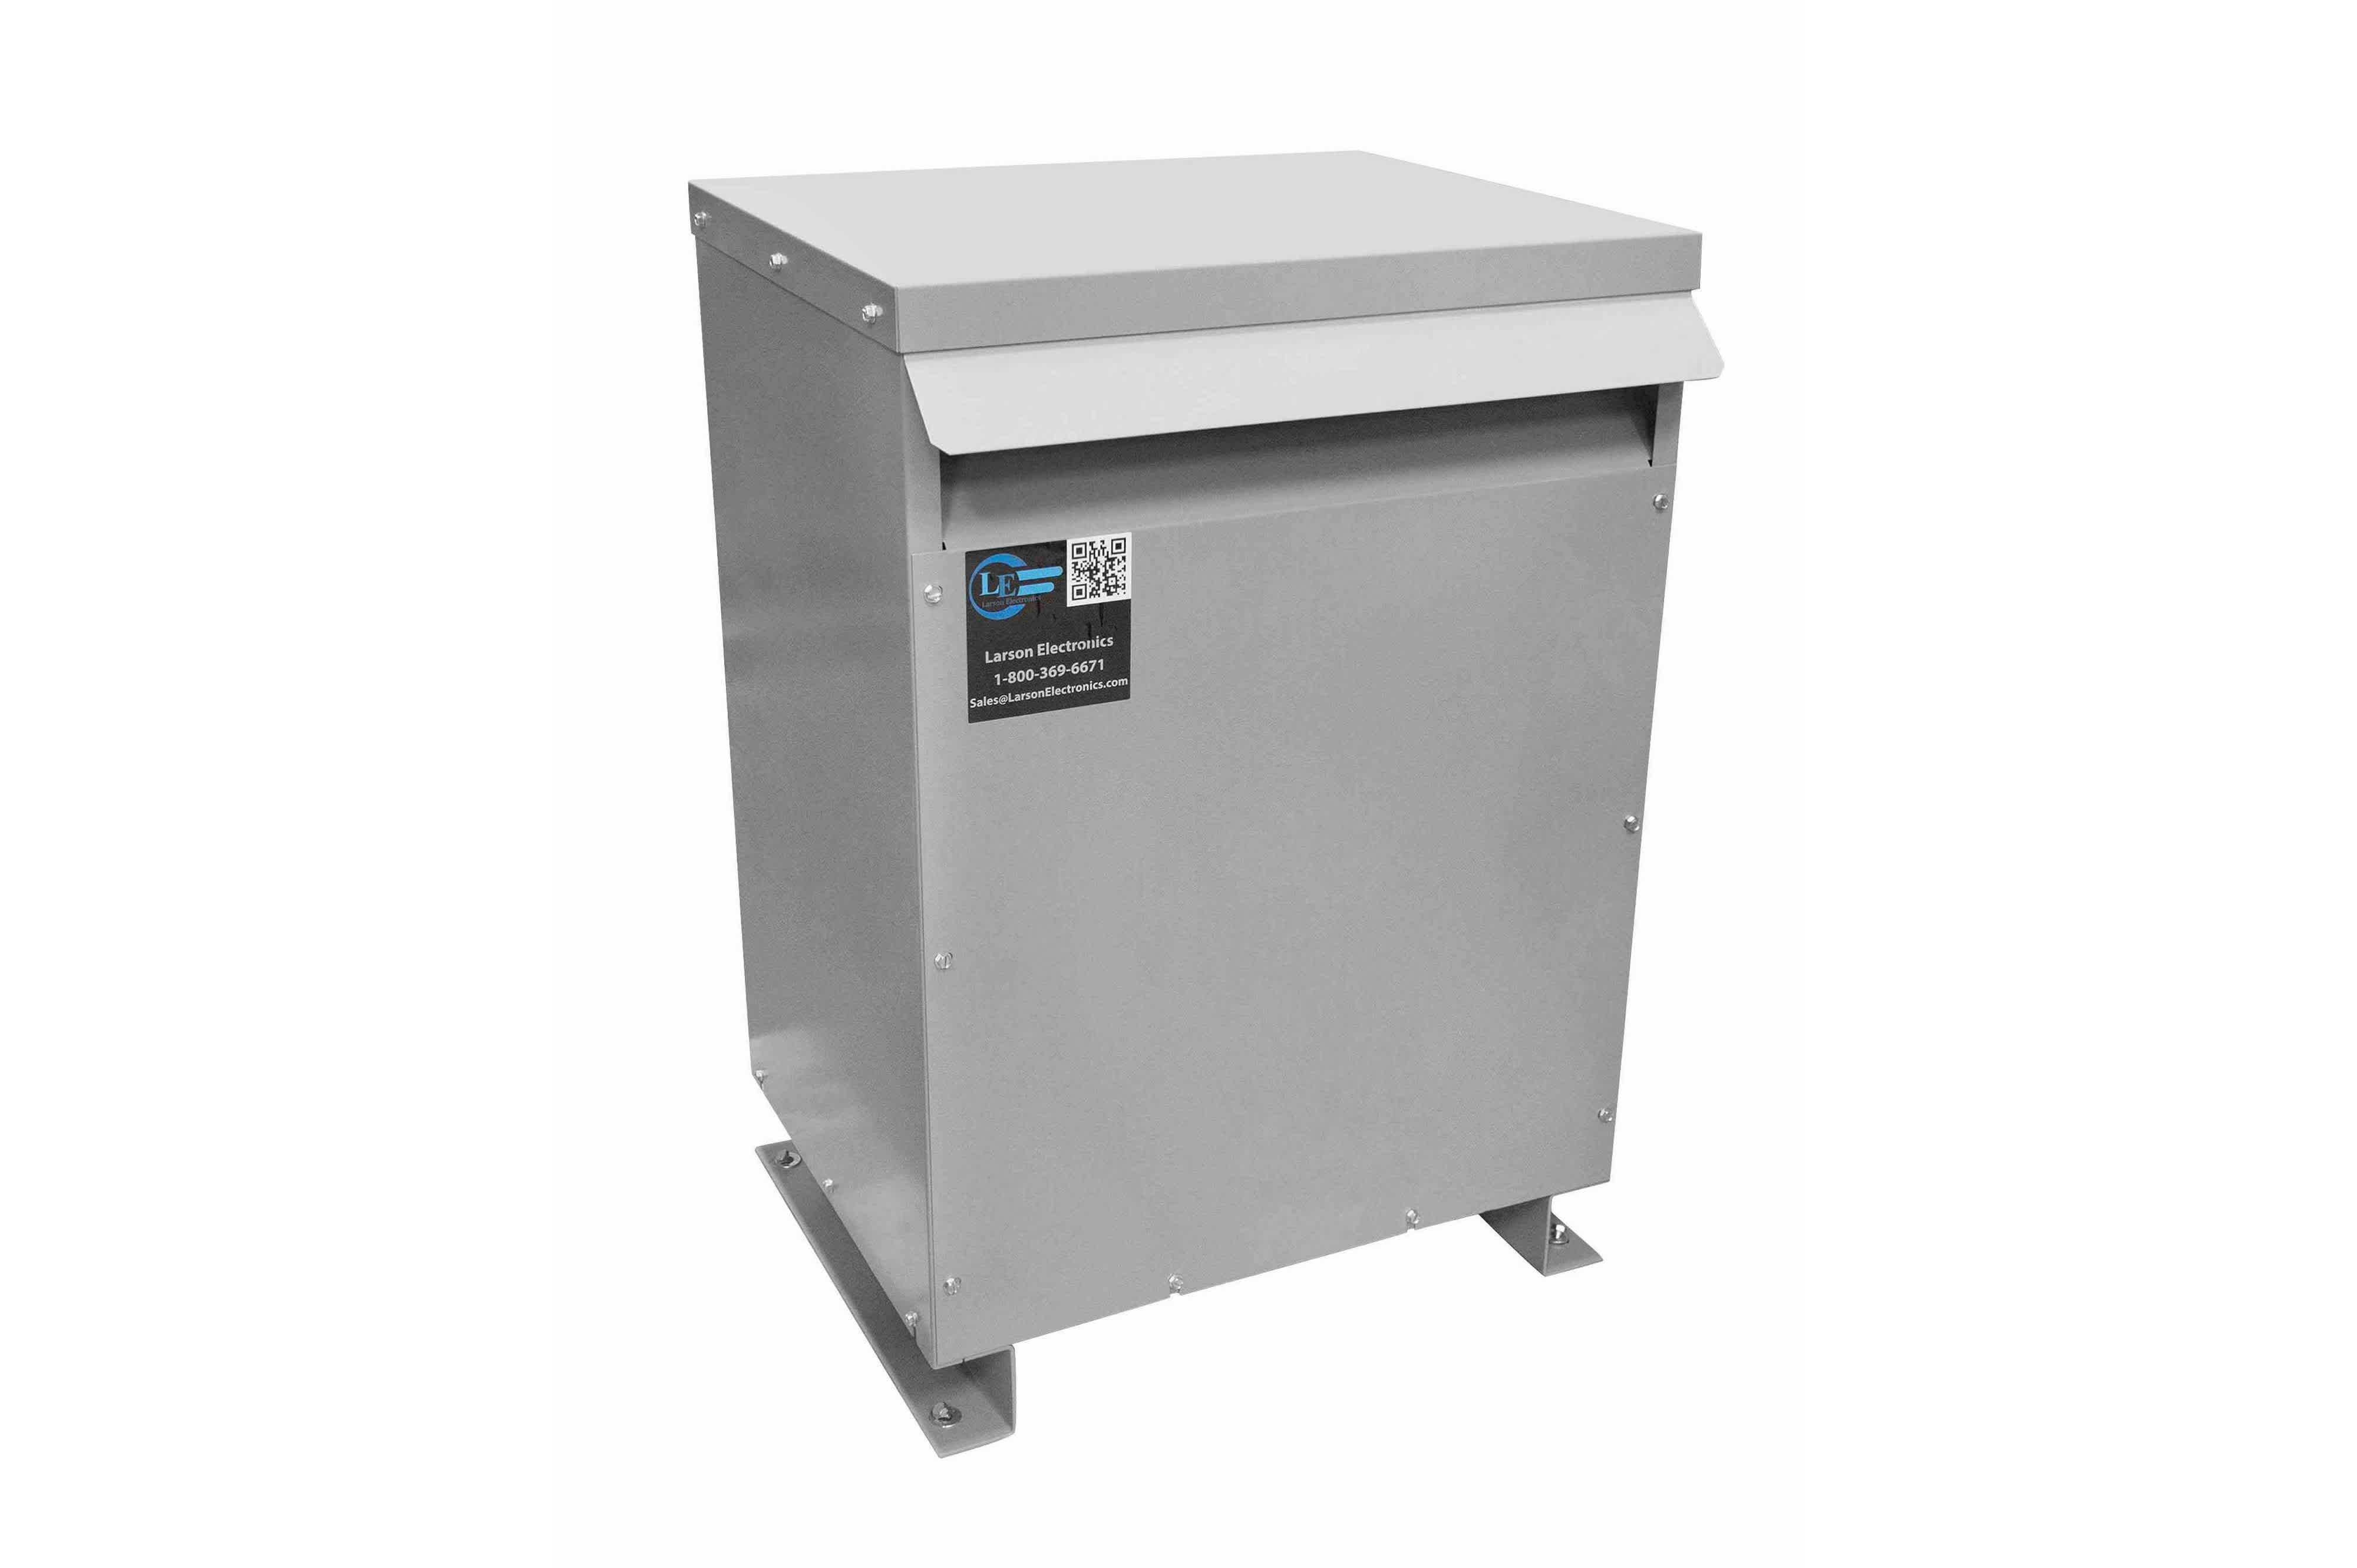 1000 kVA 3PH DOE Transformer, 240V Delta Primary, 480Y/277 Wye-N Secondary, N3R, Ventilated, 60 Hz